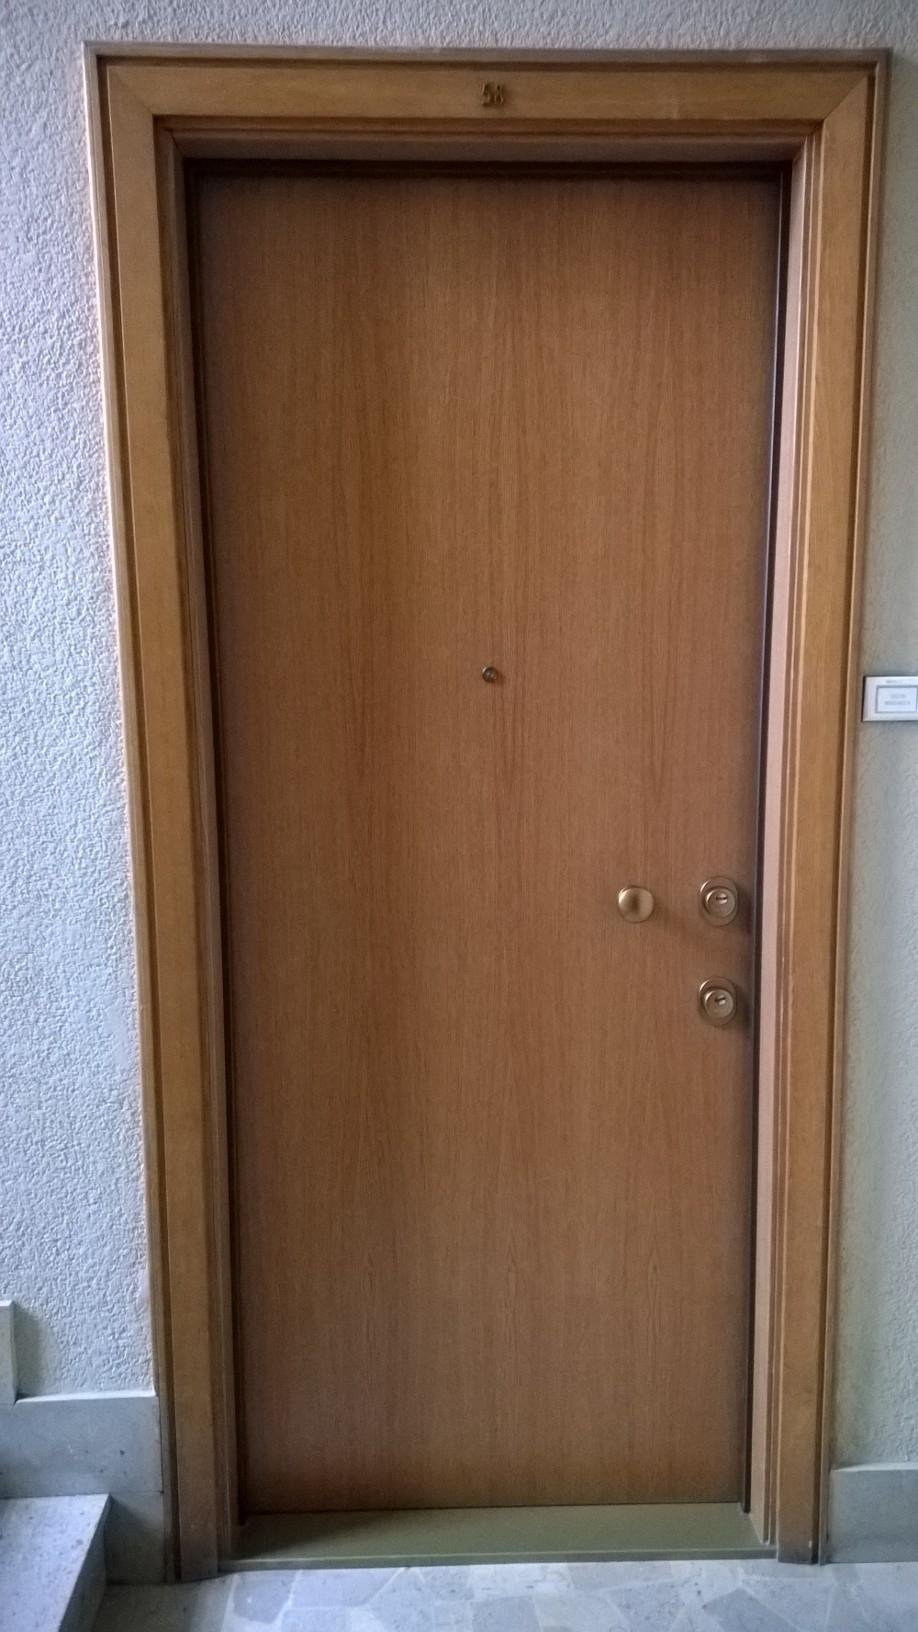 vista frontale di porta blindata